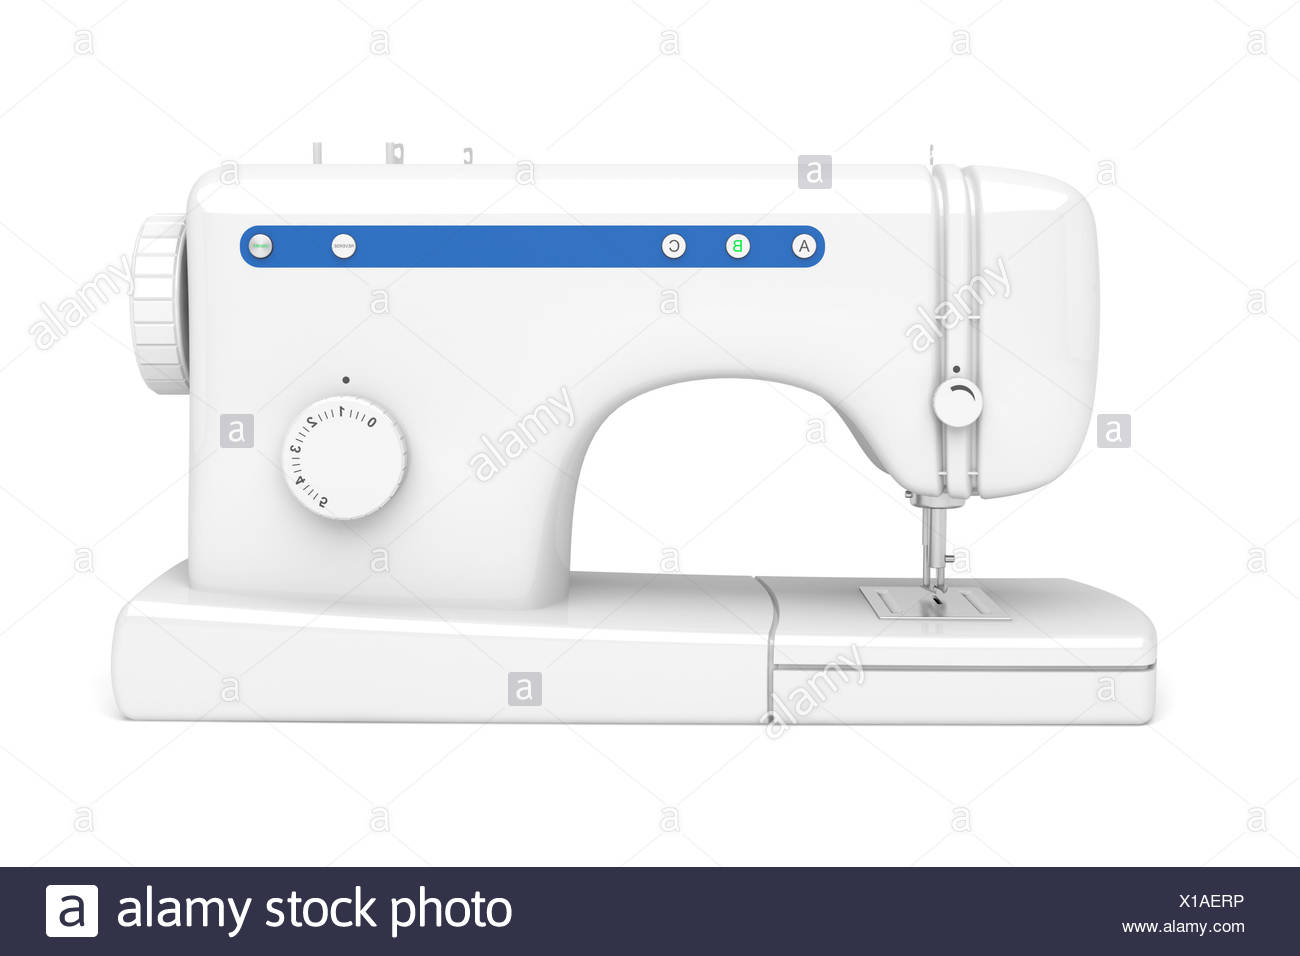 Sewing Machine Illustration Stock Photos & Sewing Machine ...